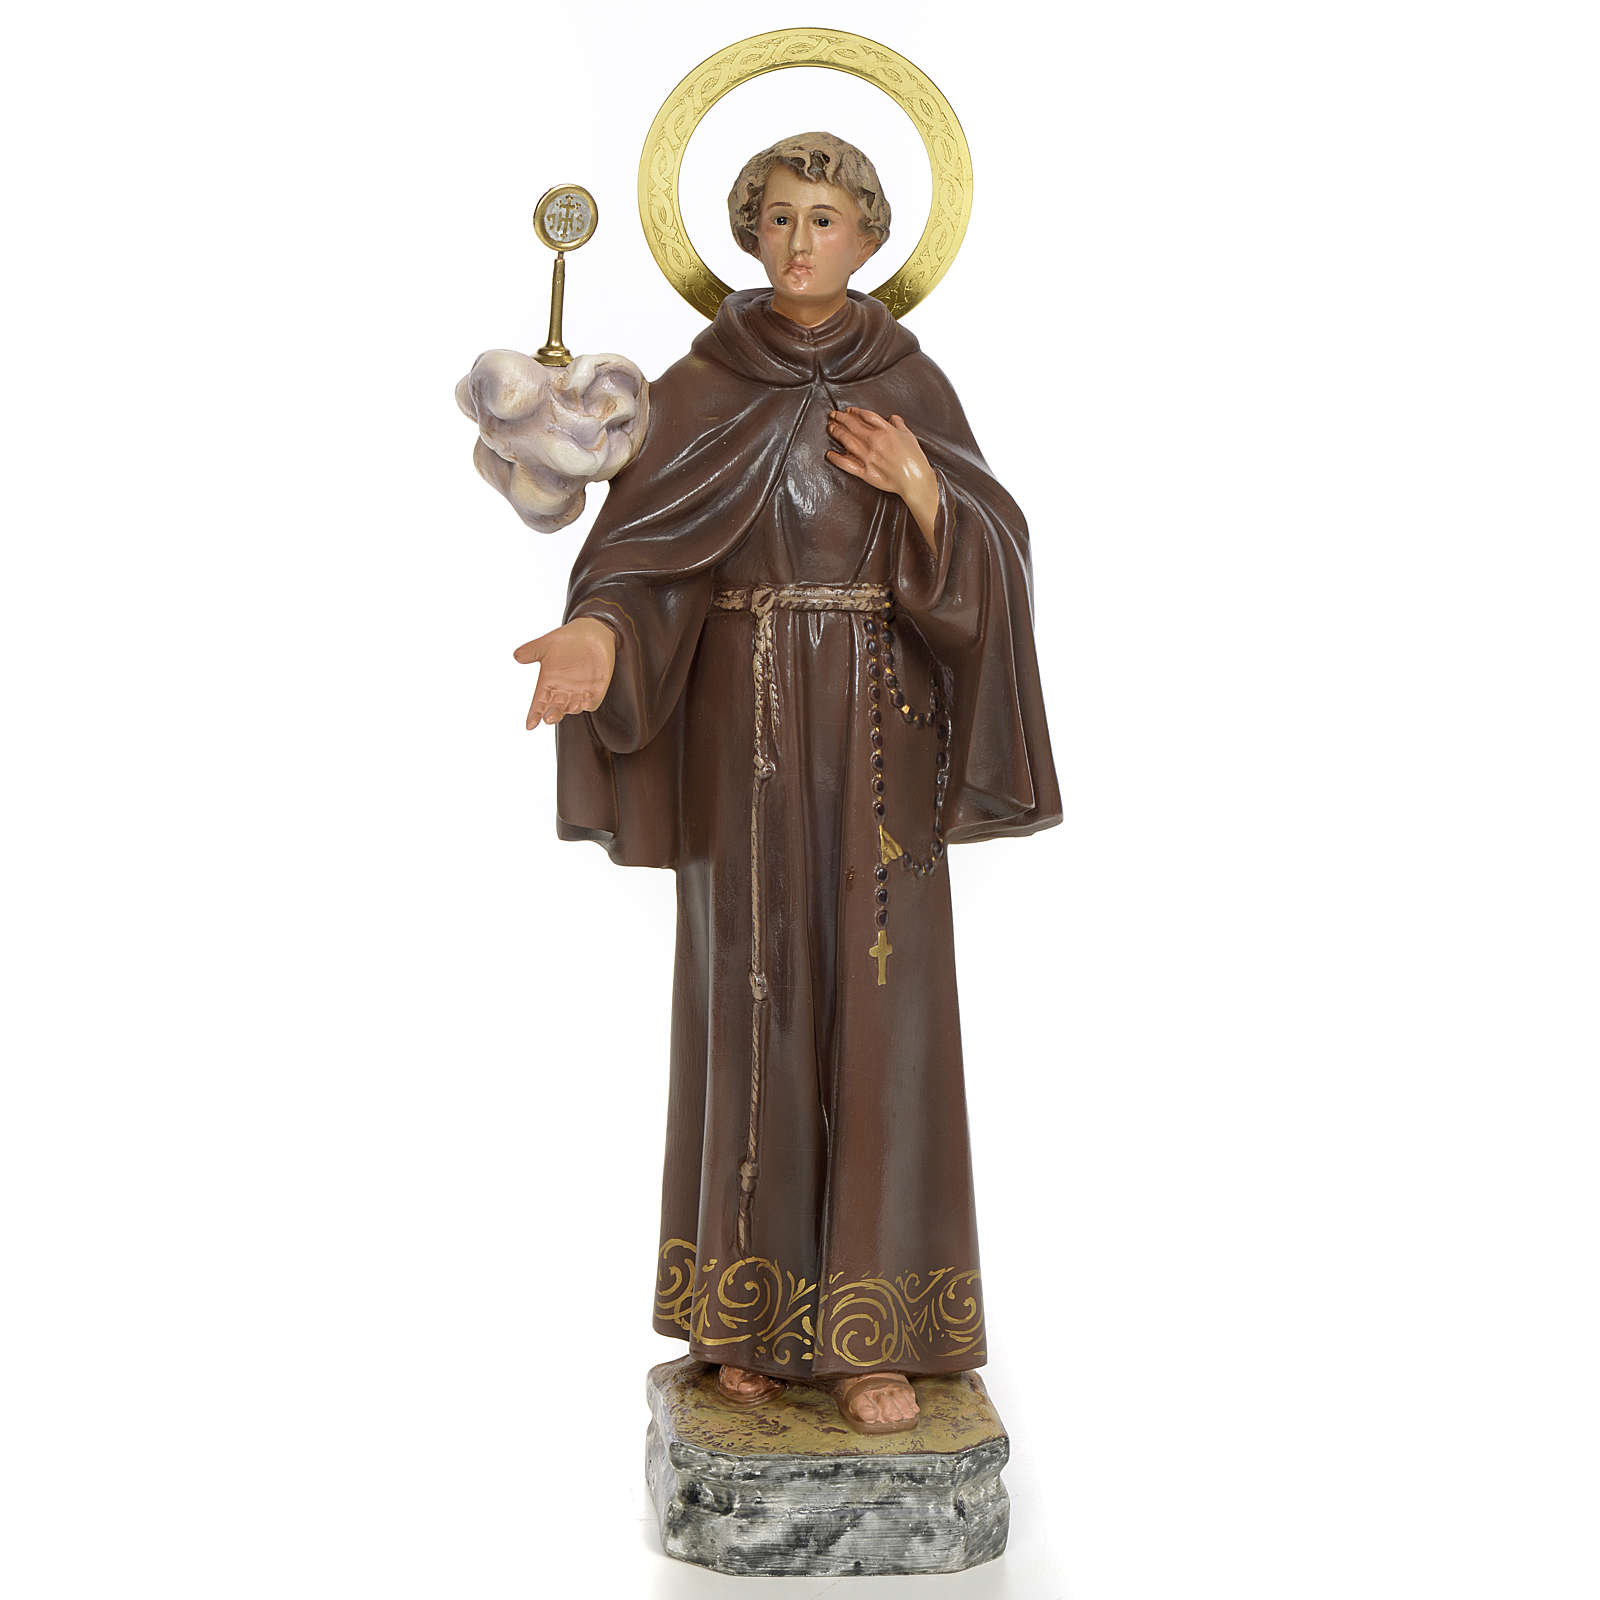 San Pasquale Baylòn 30 cm pasta di legno dec. elegante 4